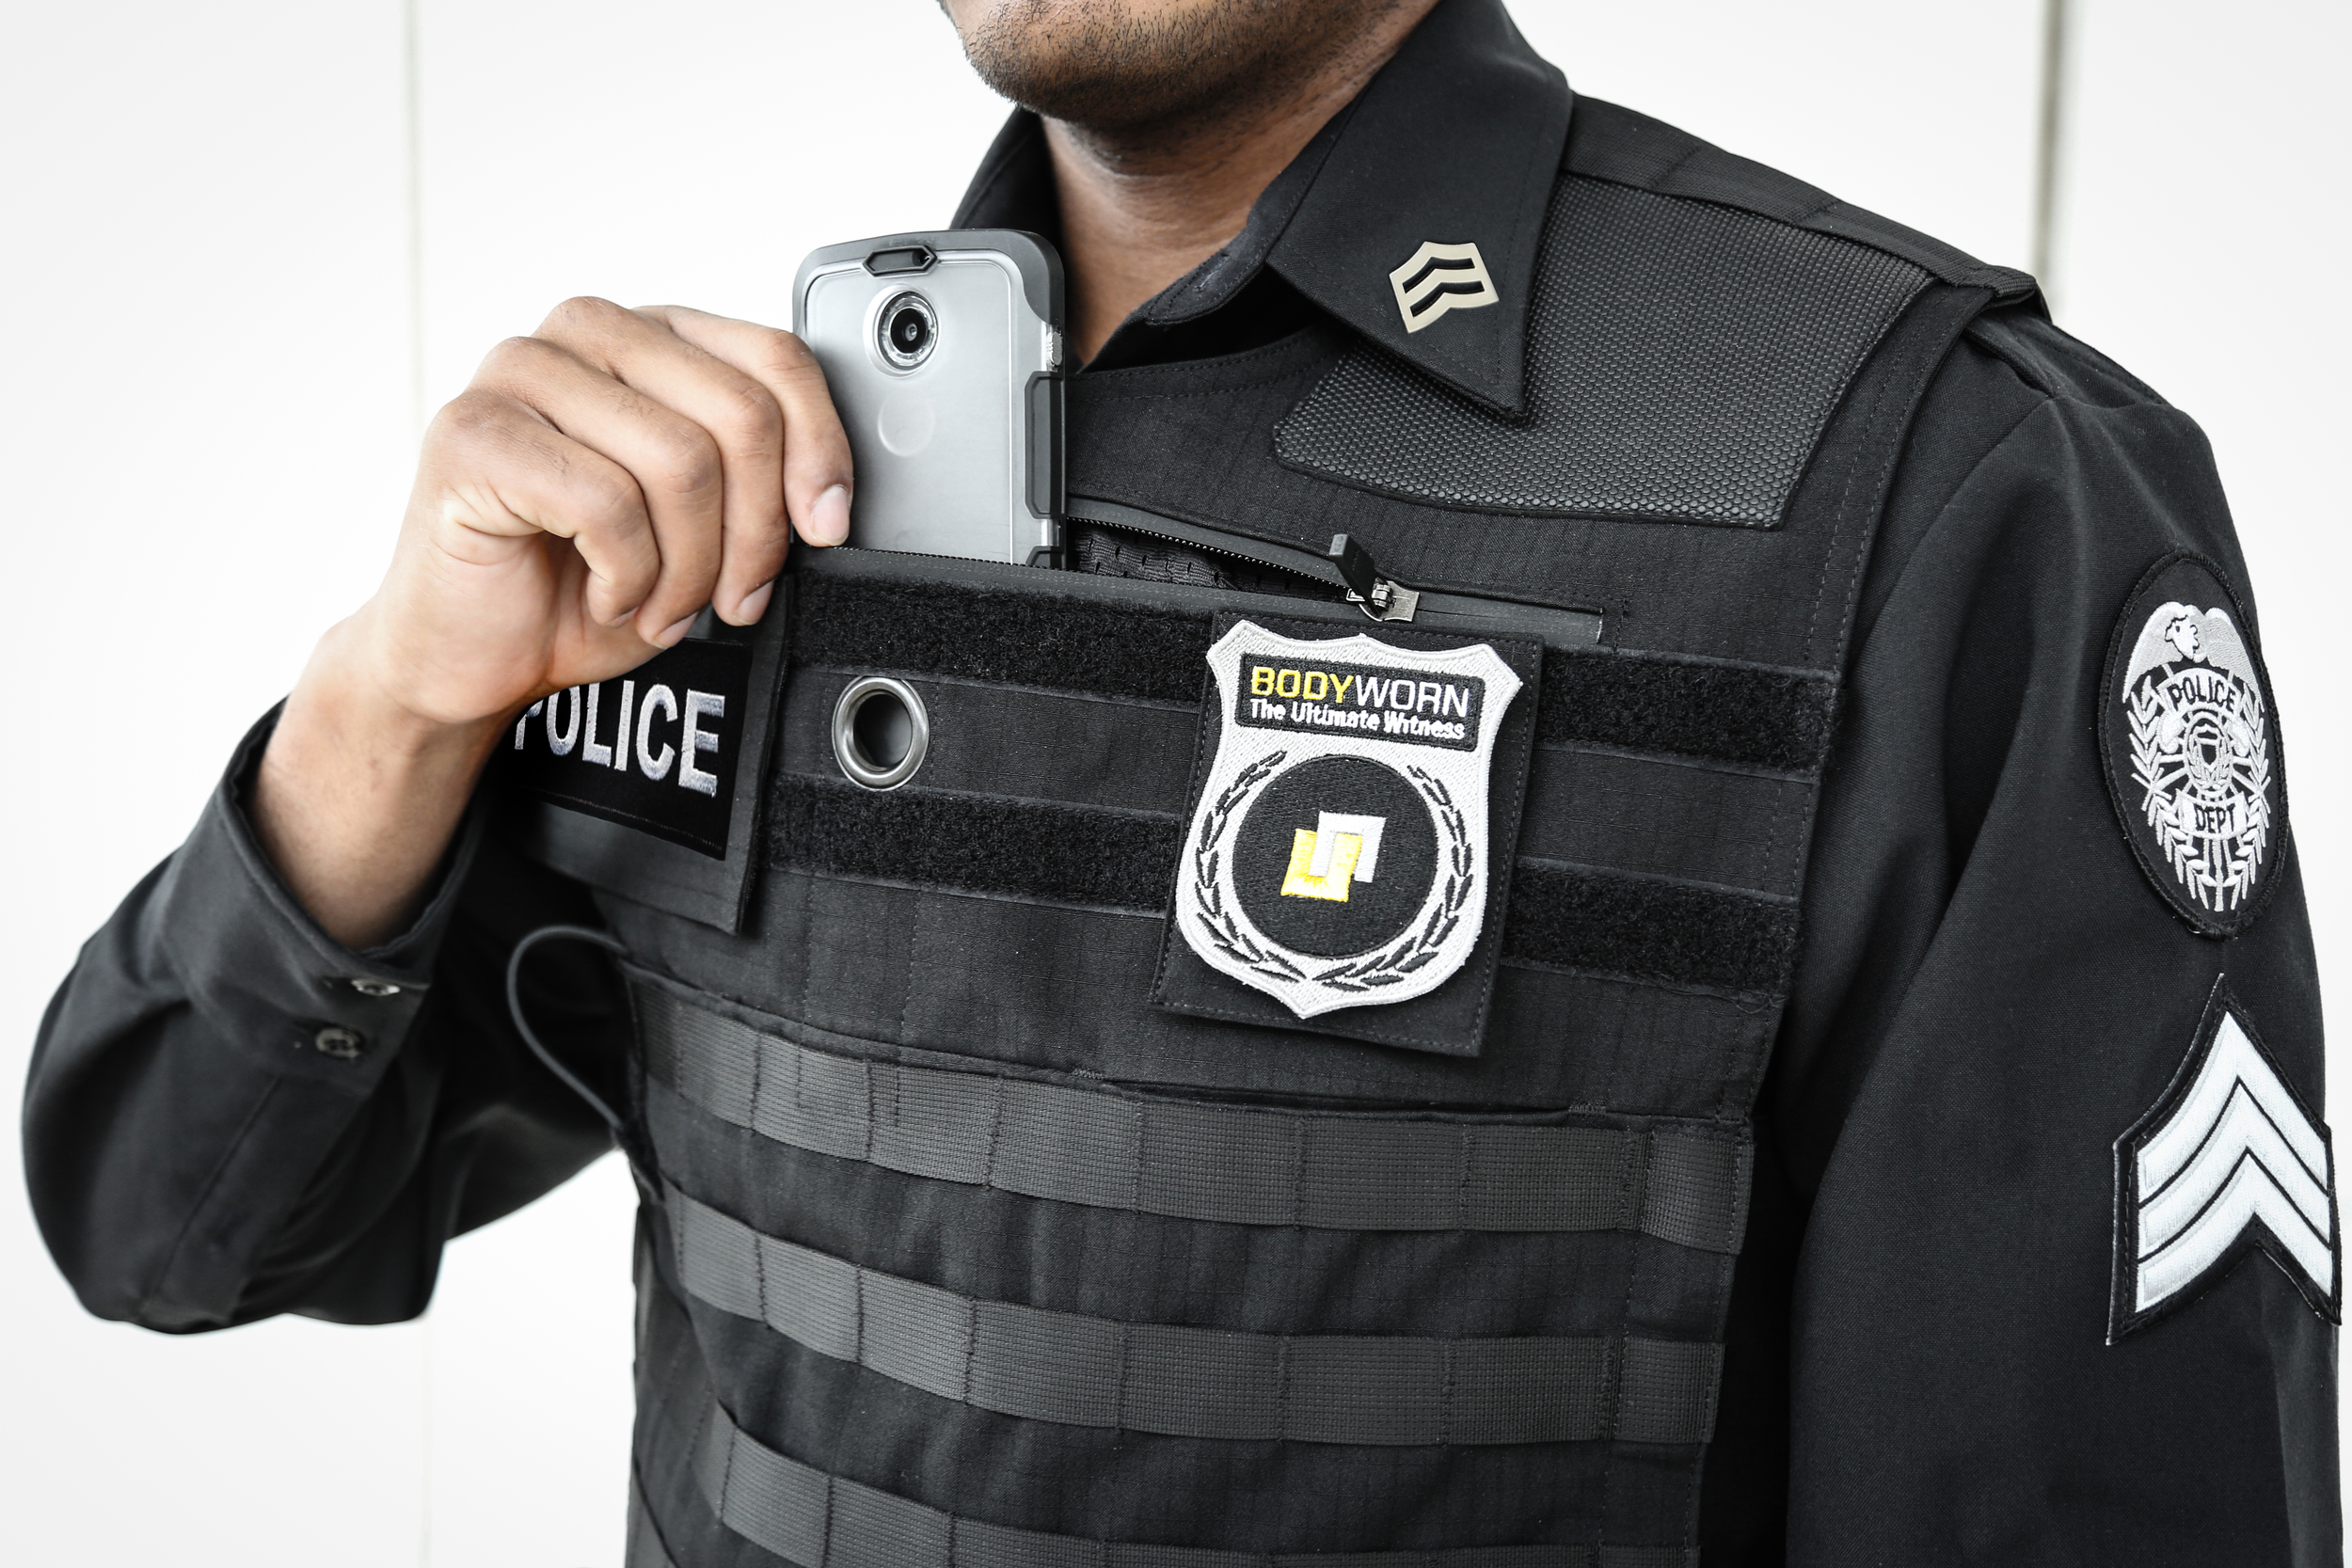 BodyWorn™ | Police Body Camera